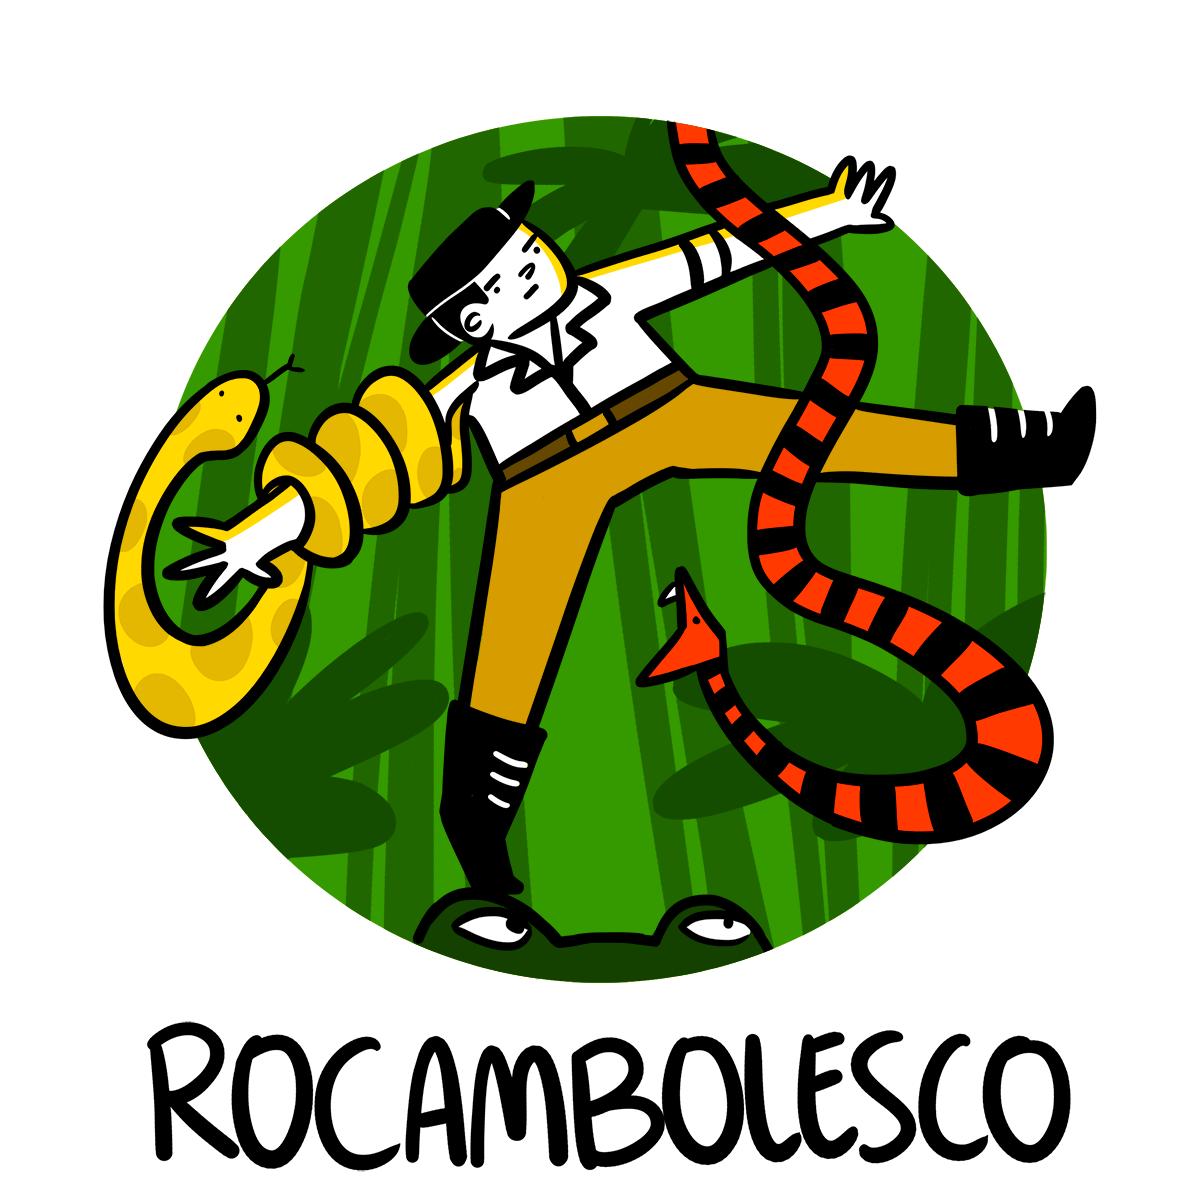 rocambolesco